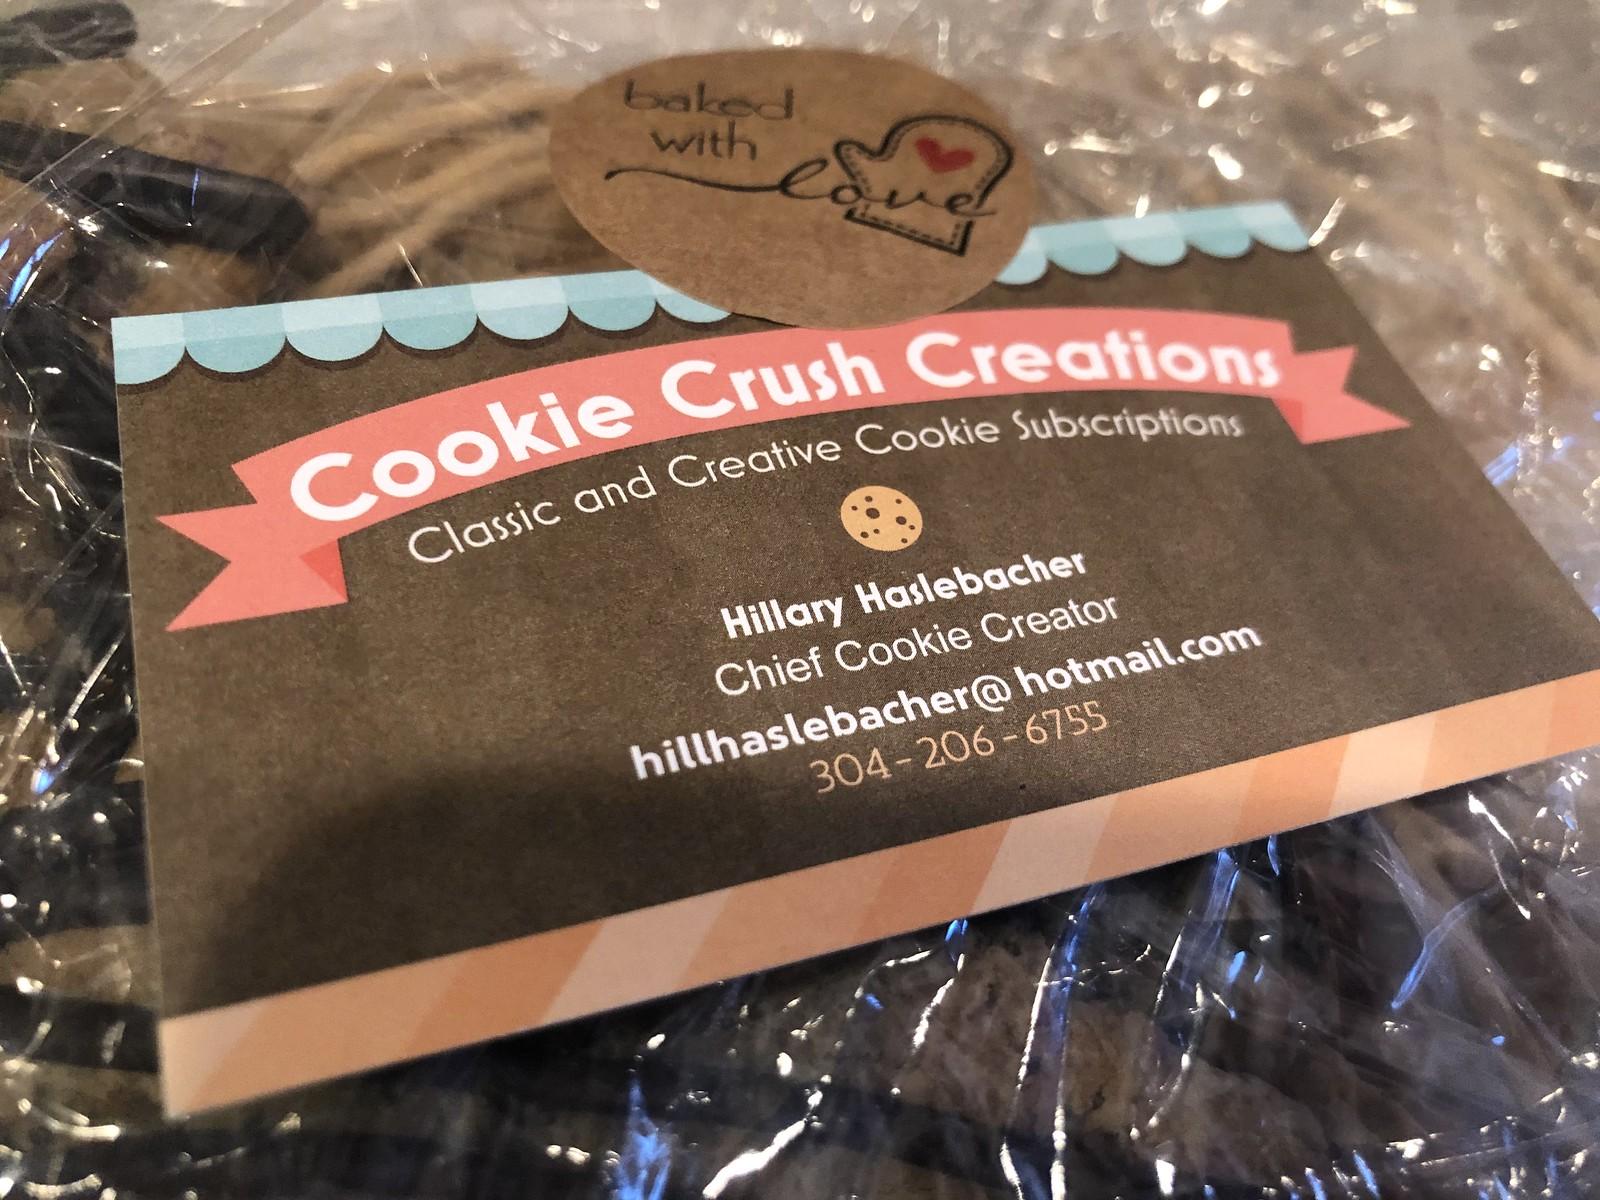 Cookie Crush Creations